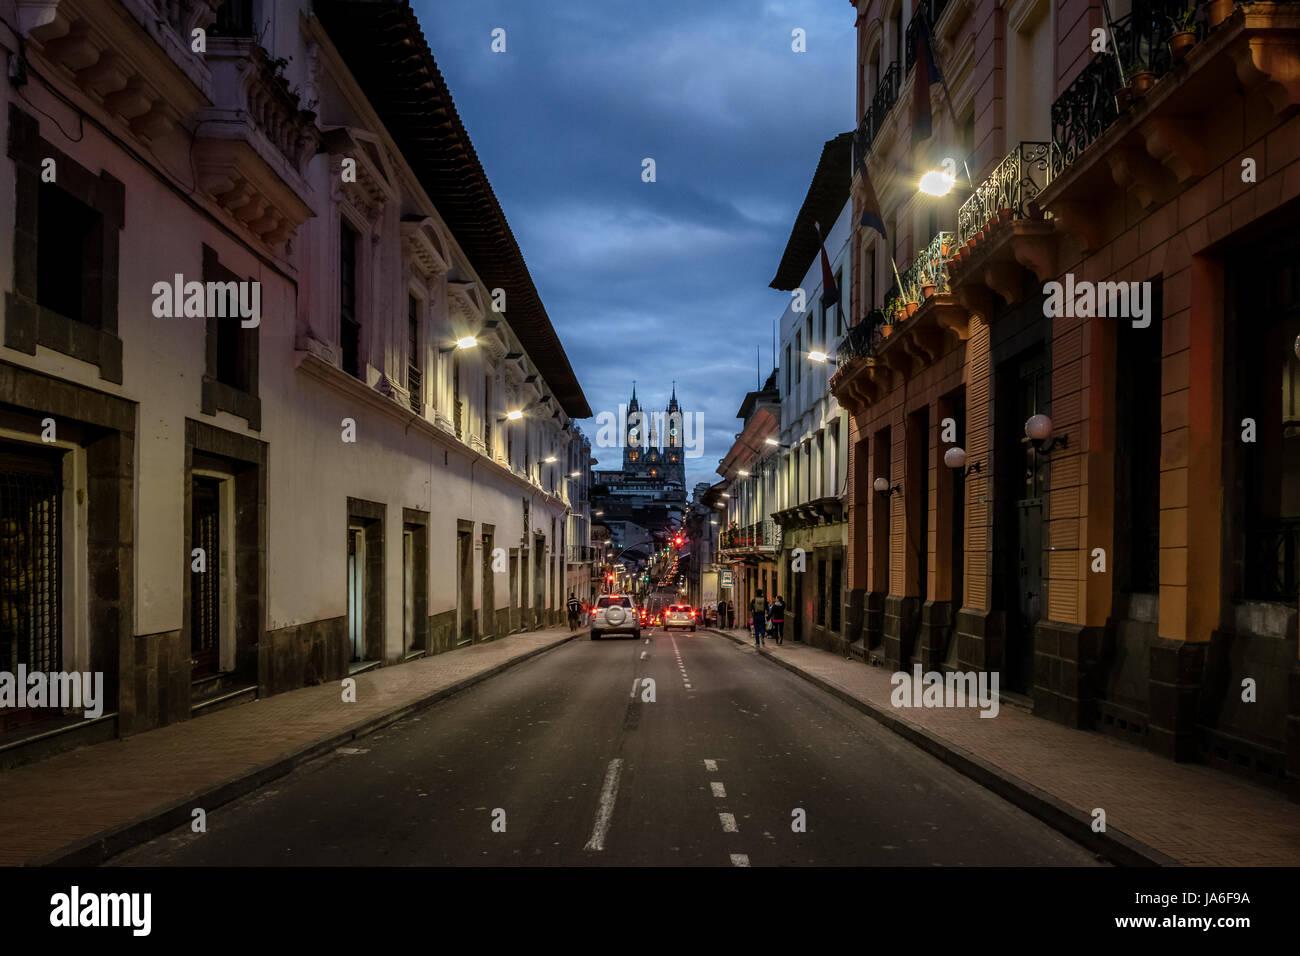 Straße von Quito und Basilika del Voto Nacional in der Nacht - Quito, Ecuador Stockbild